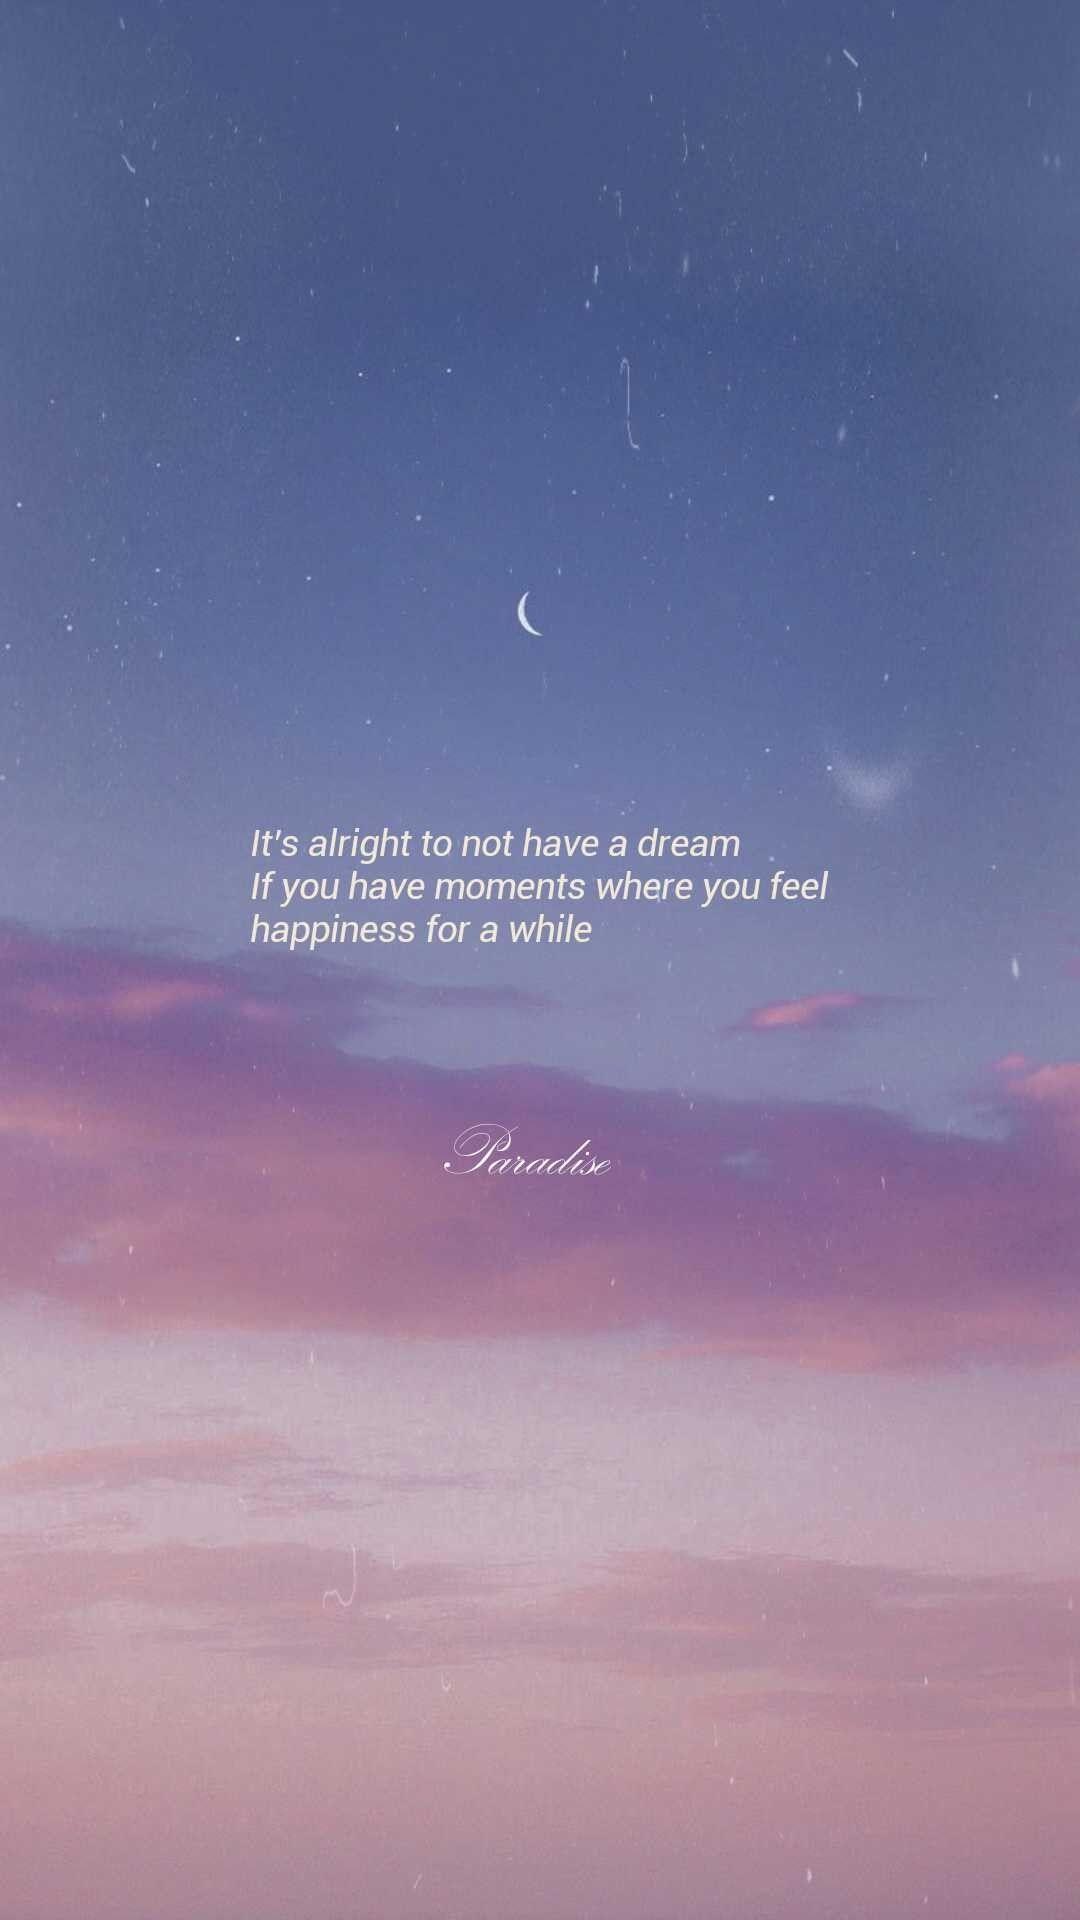 Beautiful Sentence Wallpaper Quotes Bts Lyrics Quotes